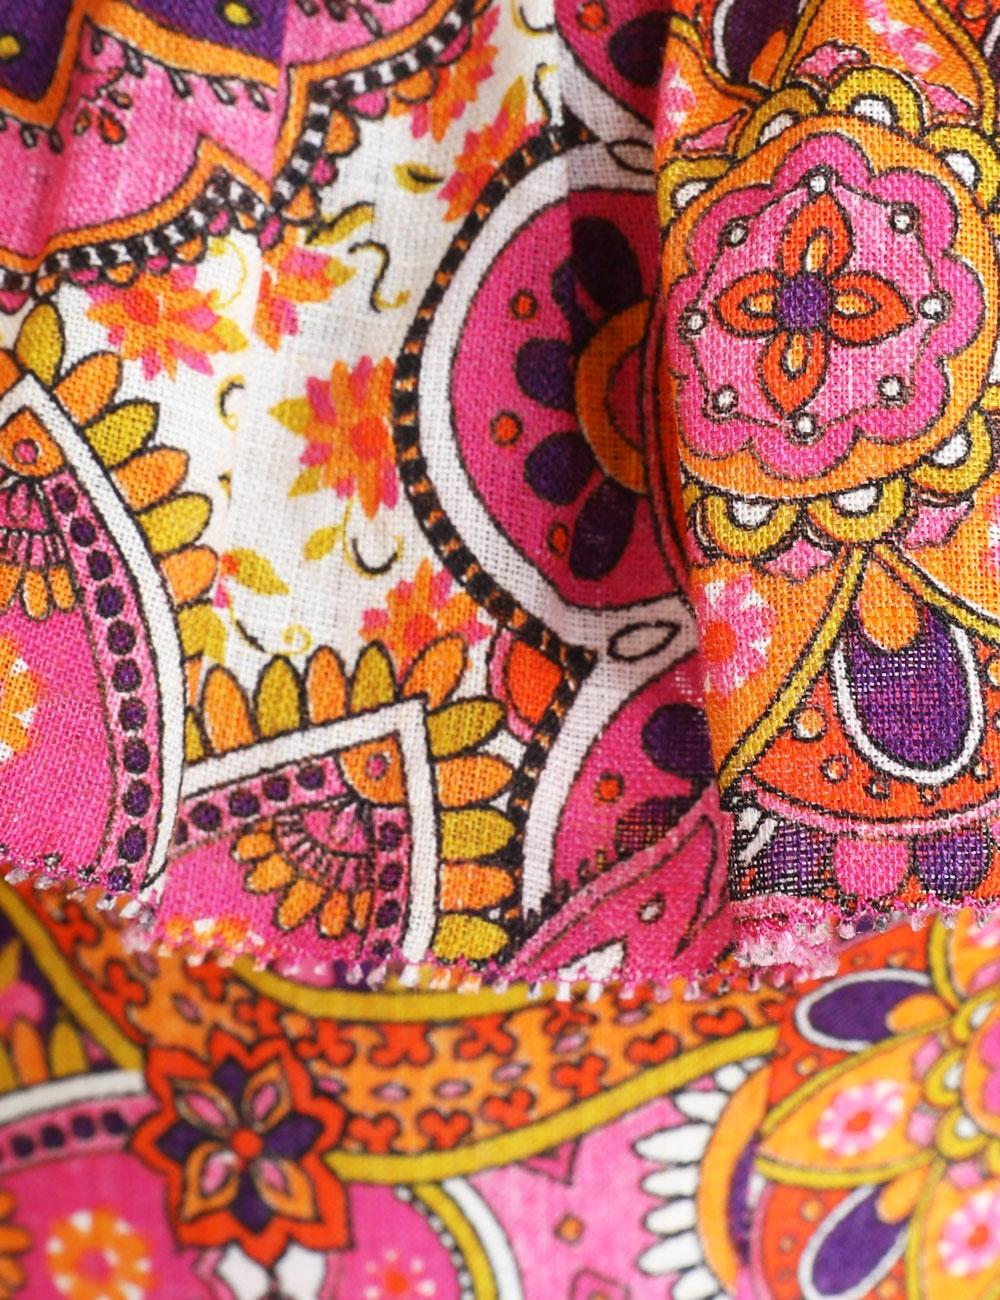 Fiesta Ruffle Neck Long Dress